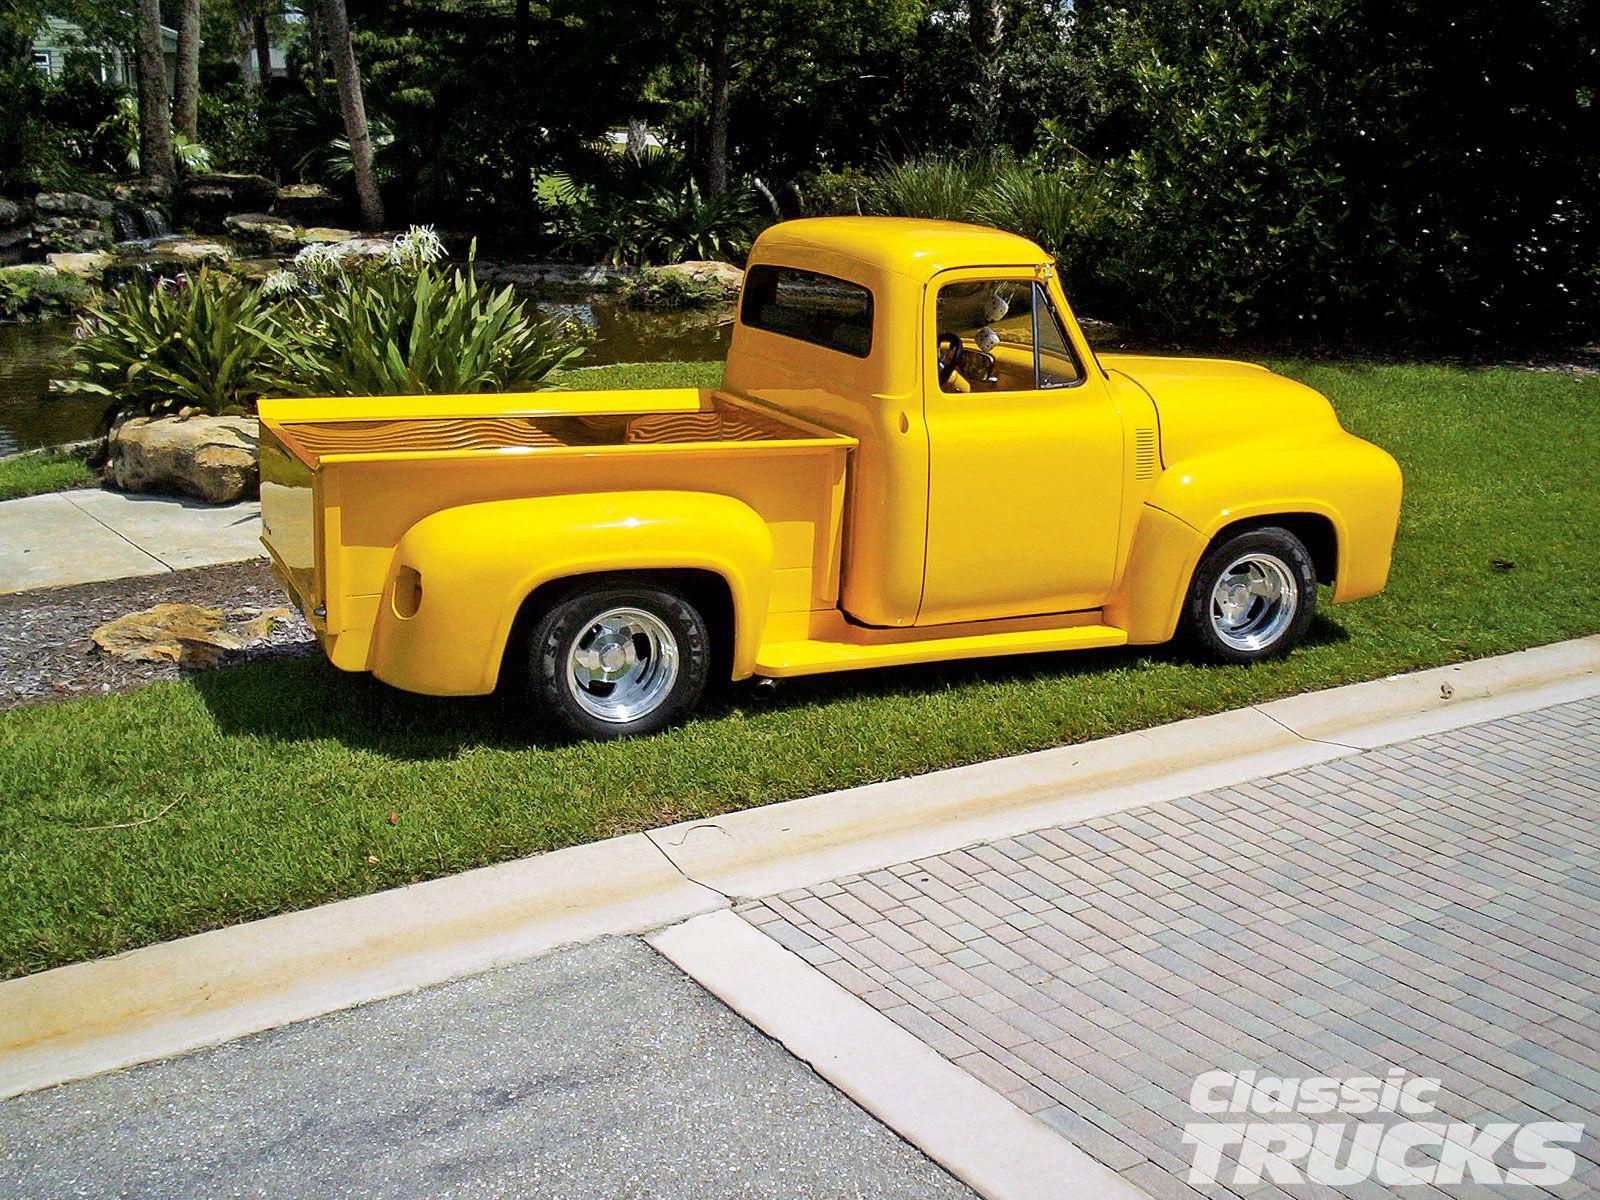 Classic ford trucks 1954 ford f100 pickup truck custom suspension kit photo 1